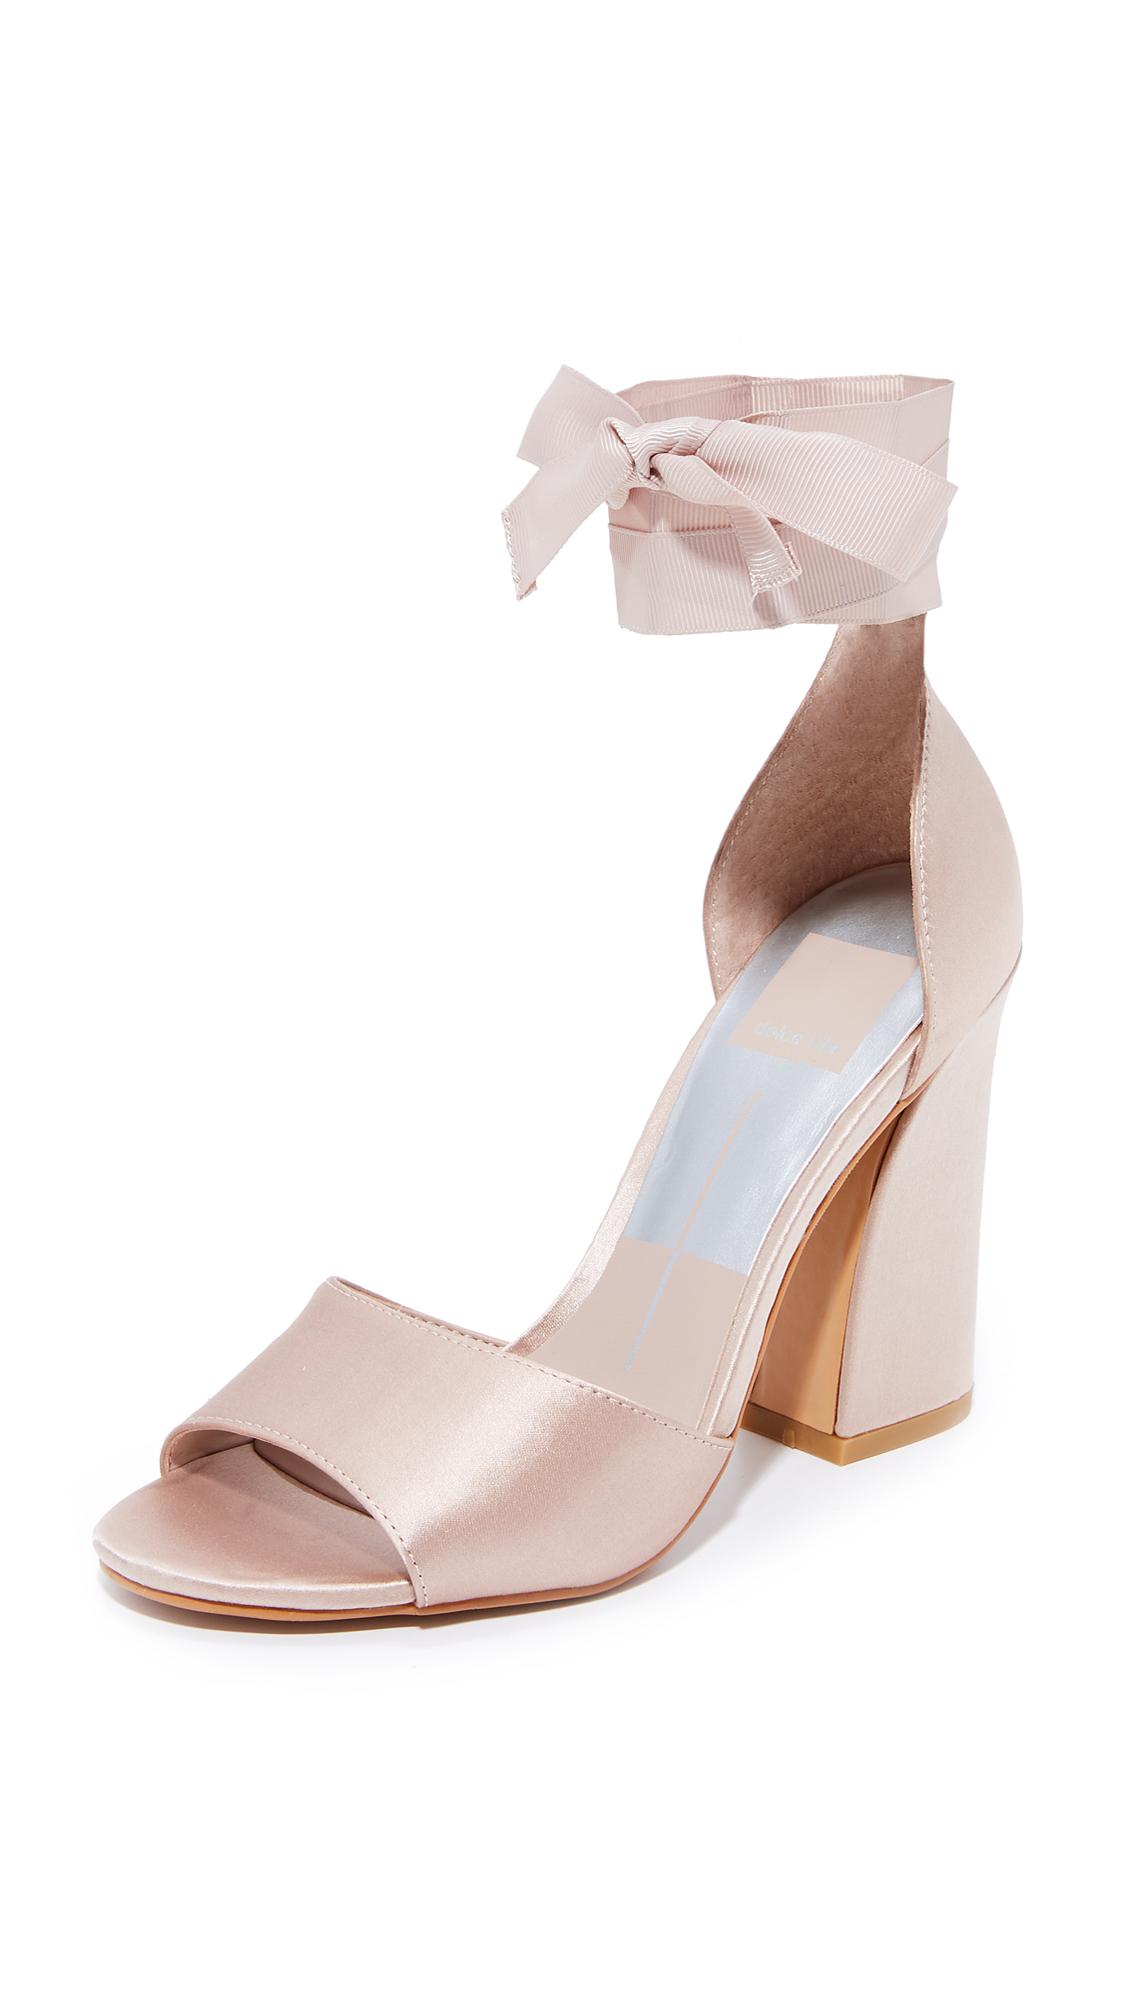 Dolce Vita Harvey Wrap Sandals - Rose